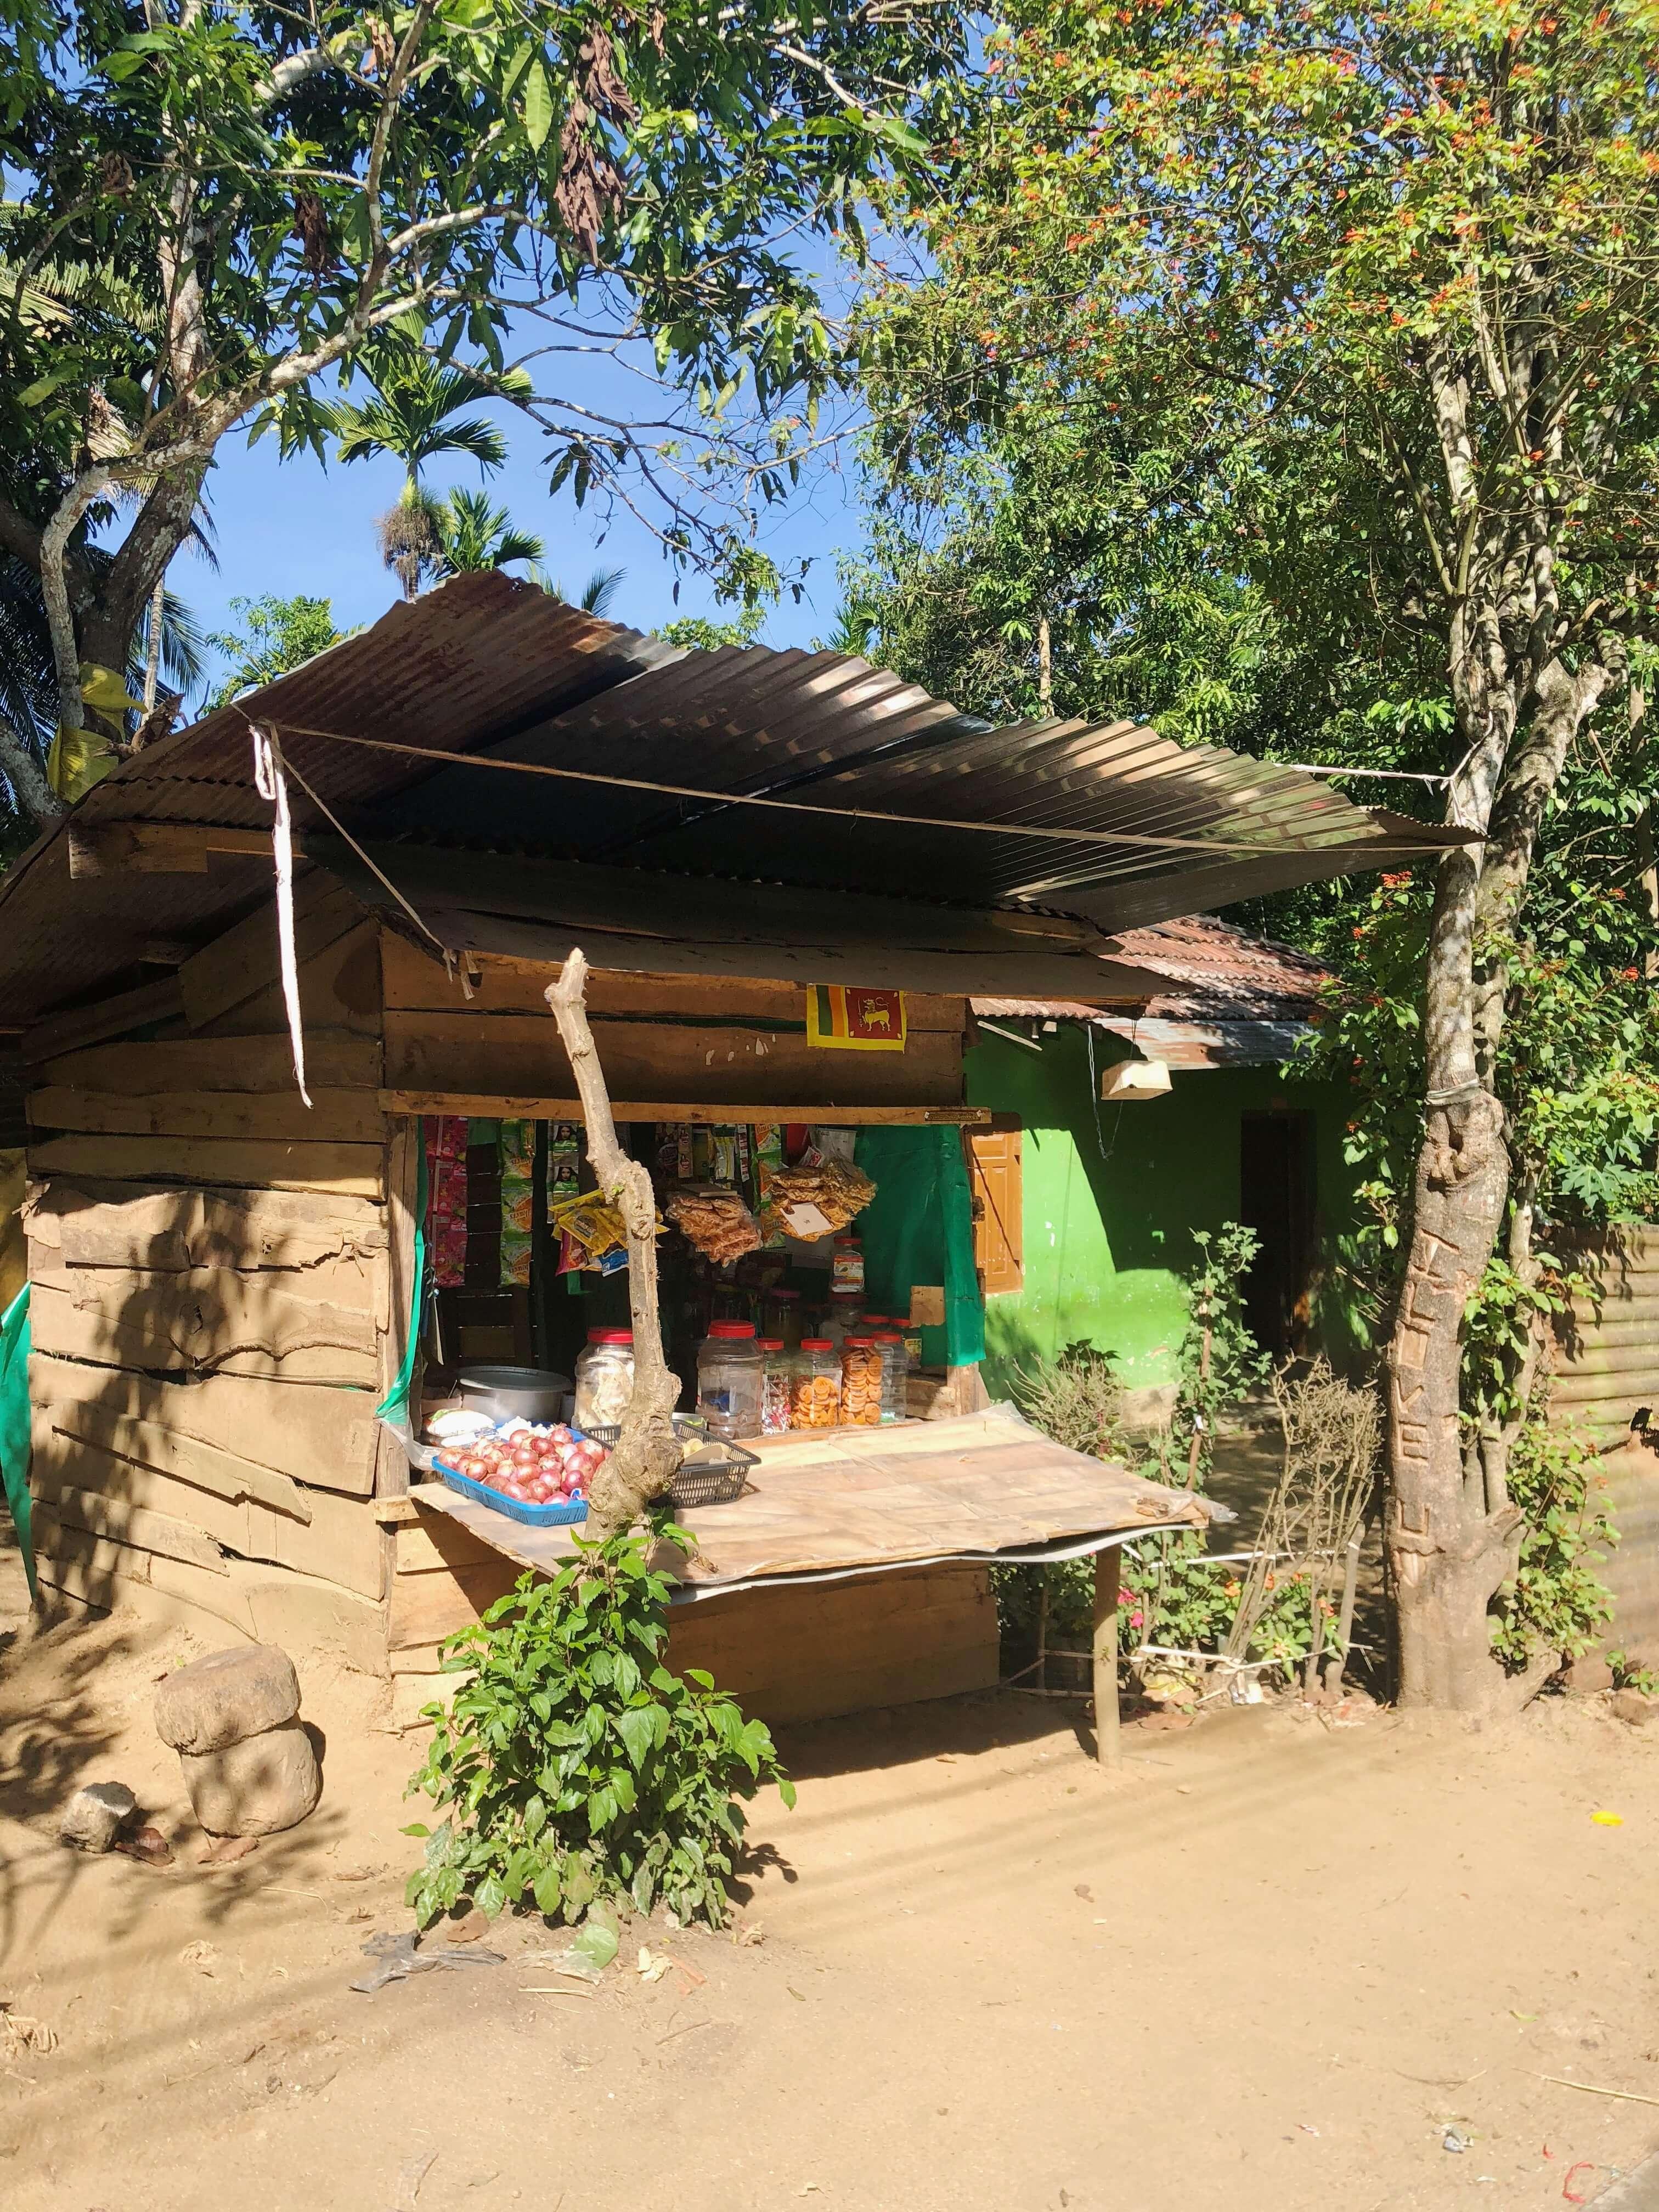 Snack Hut on the side of the road, Kandy Sri Lanka